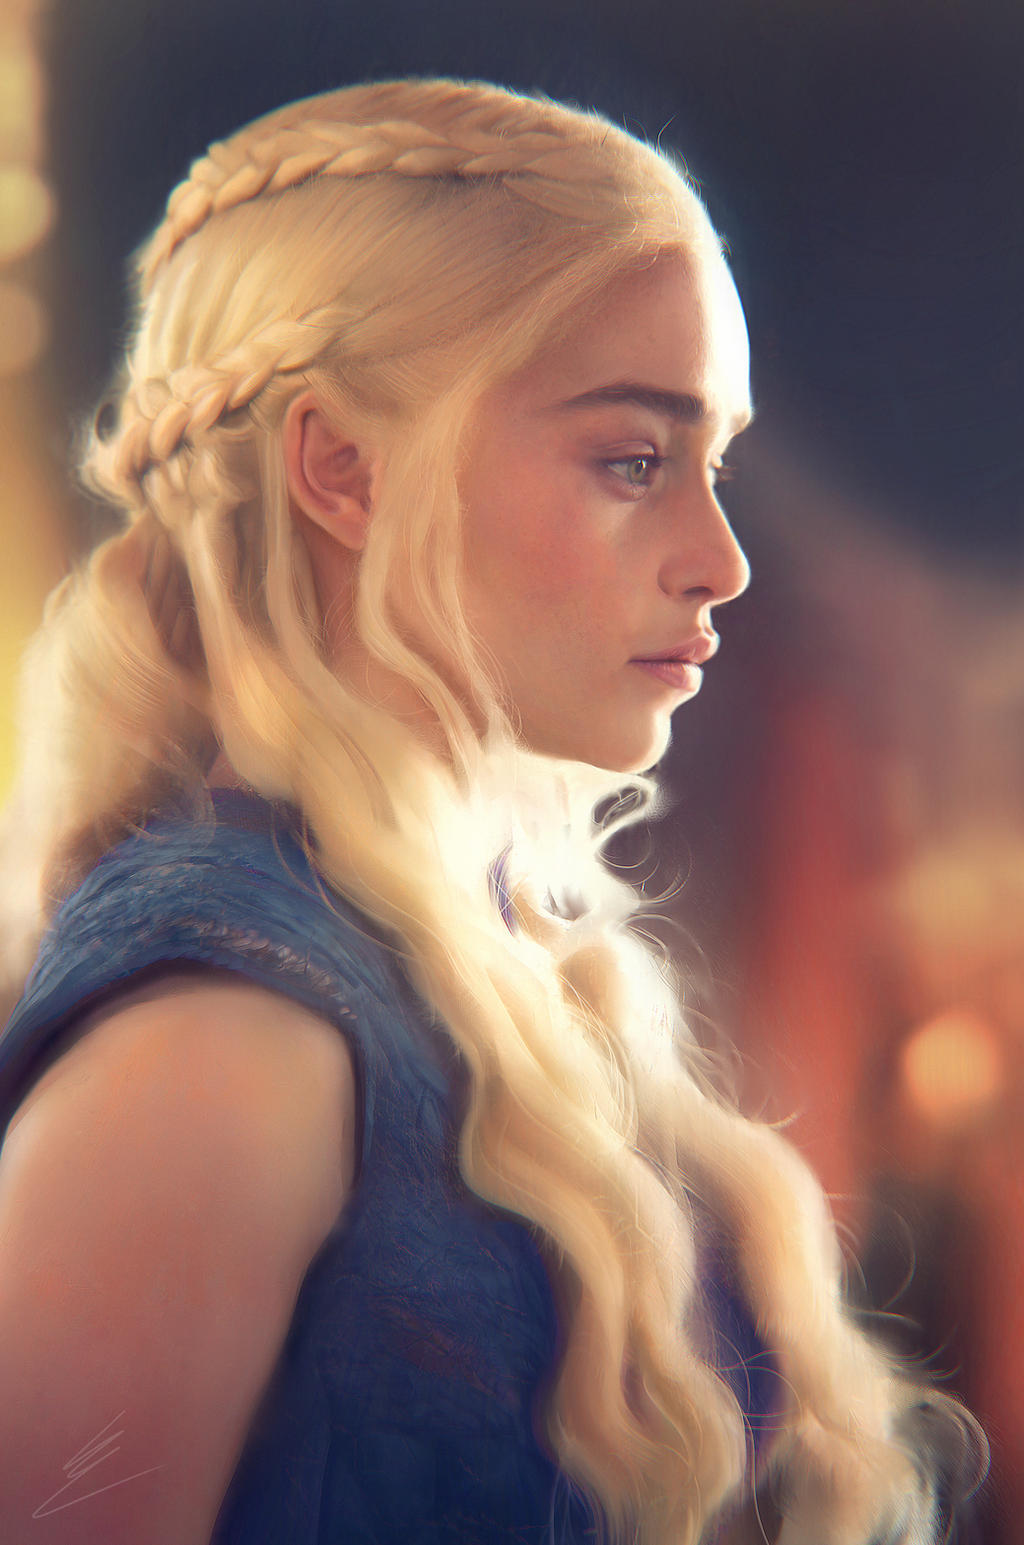 Daenerys Targaryen Portrait study by Carl-Ellistrator